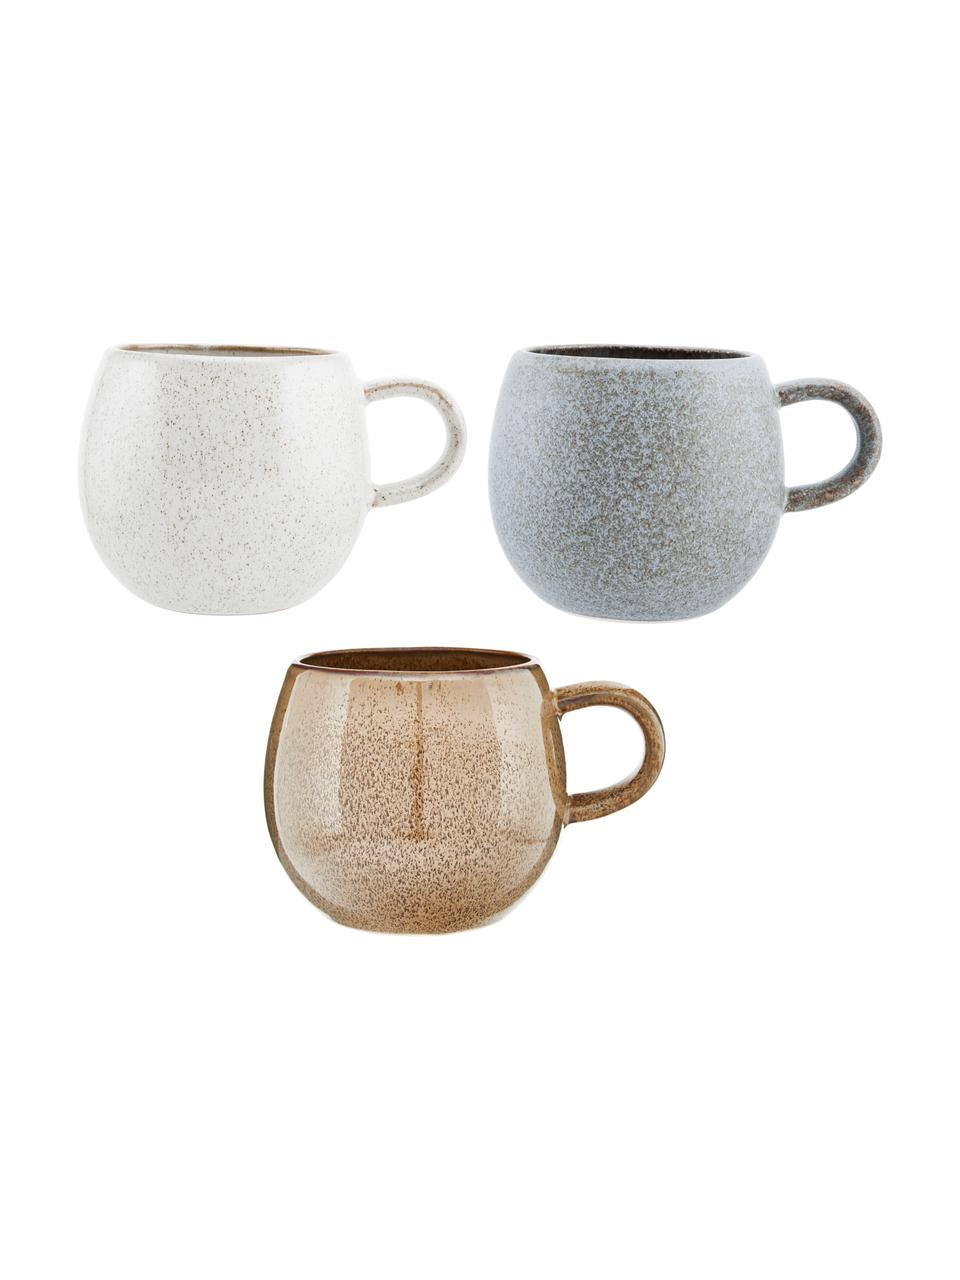 Set 3 tazze da tè fatte a mano Addison, Gres, Grigio, Beige, bianco, Ø 11 x Alt. 10 cm